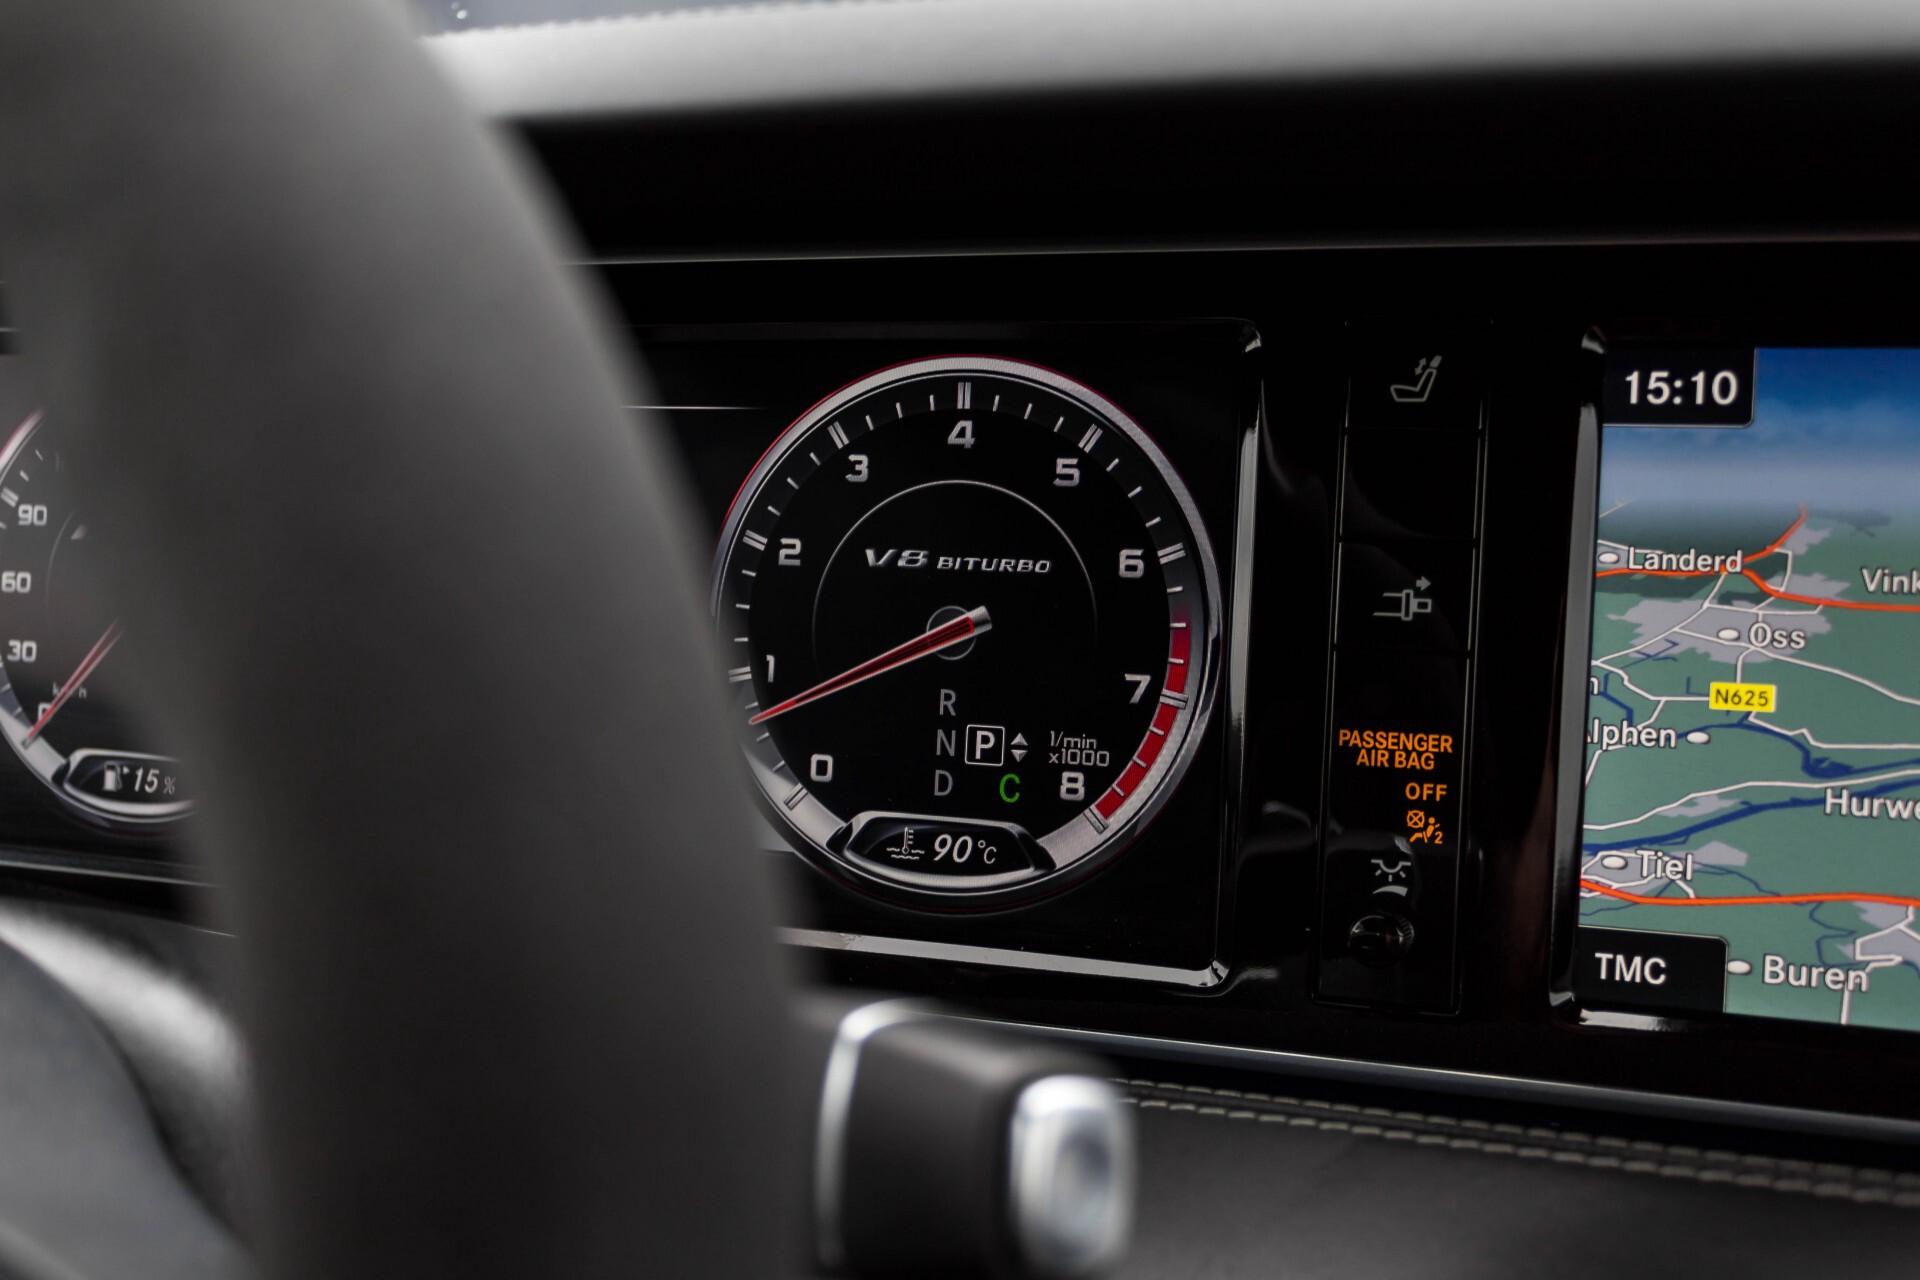 Mercedes-Benz S-Klasse Cabrio 63 AMG 4-M Ceramic/Designo/Carbon/Burmester High End Aut Foto 18